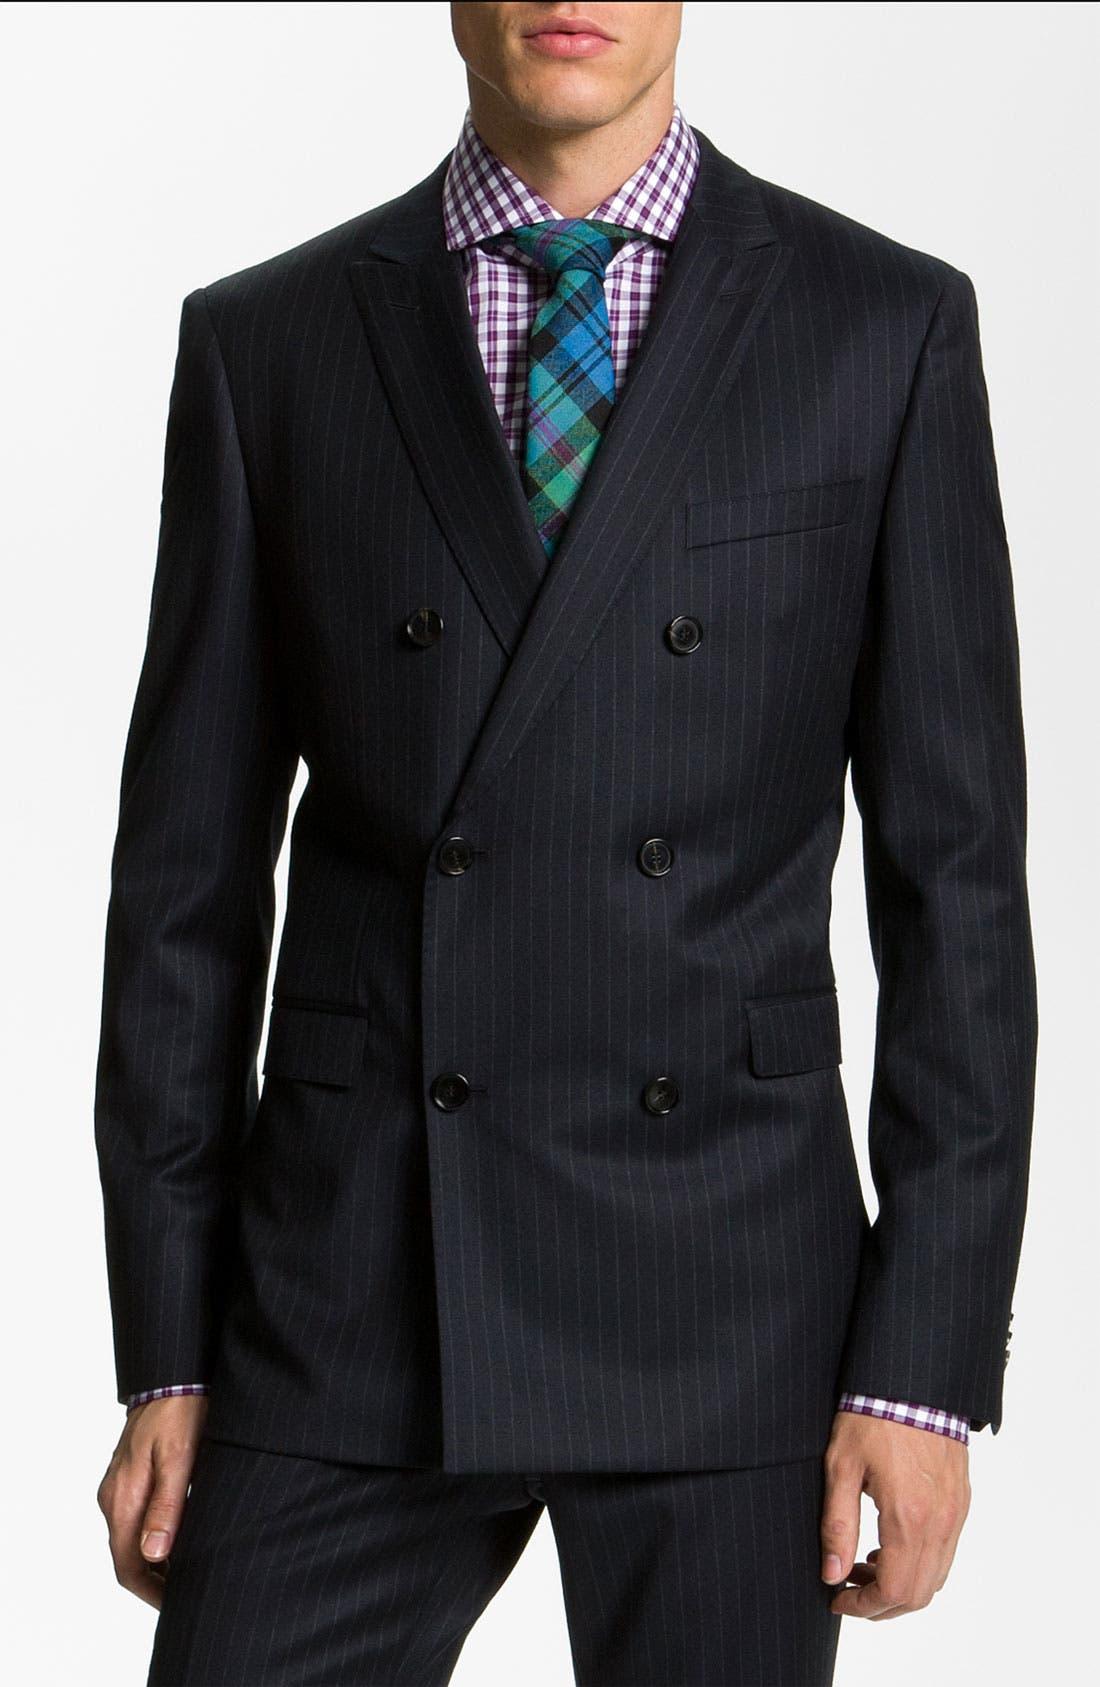 Alternate Image 1 Selected - BOSS Black 'Rusty/Win' Stripe Suit